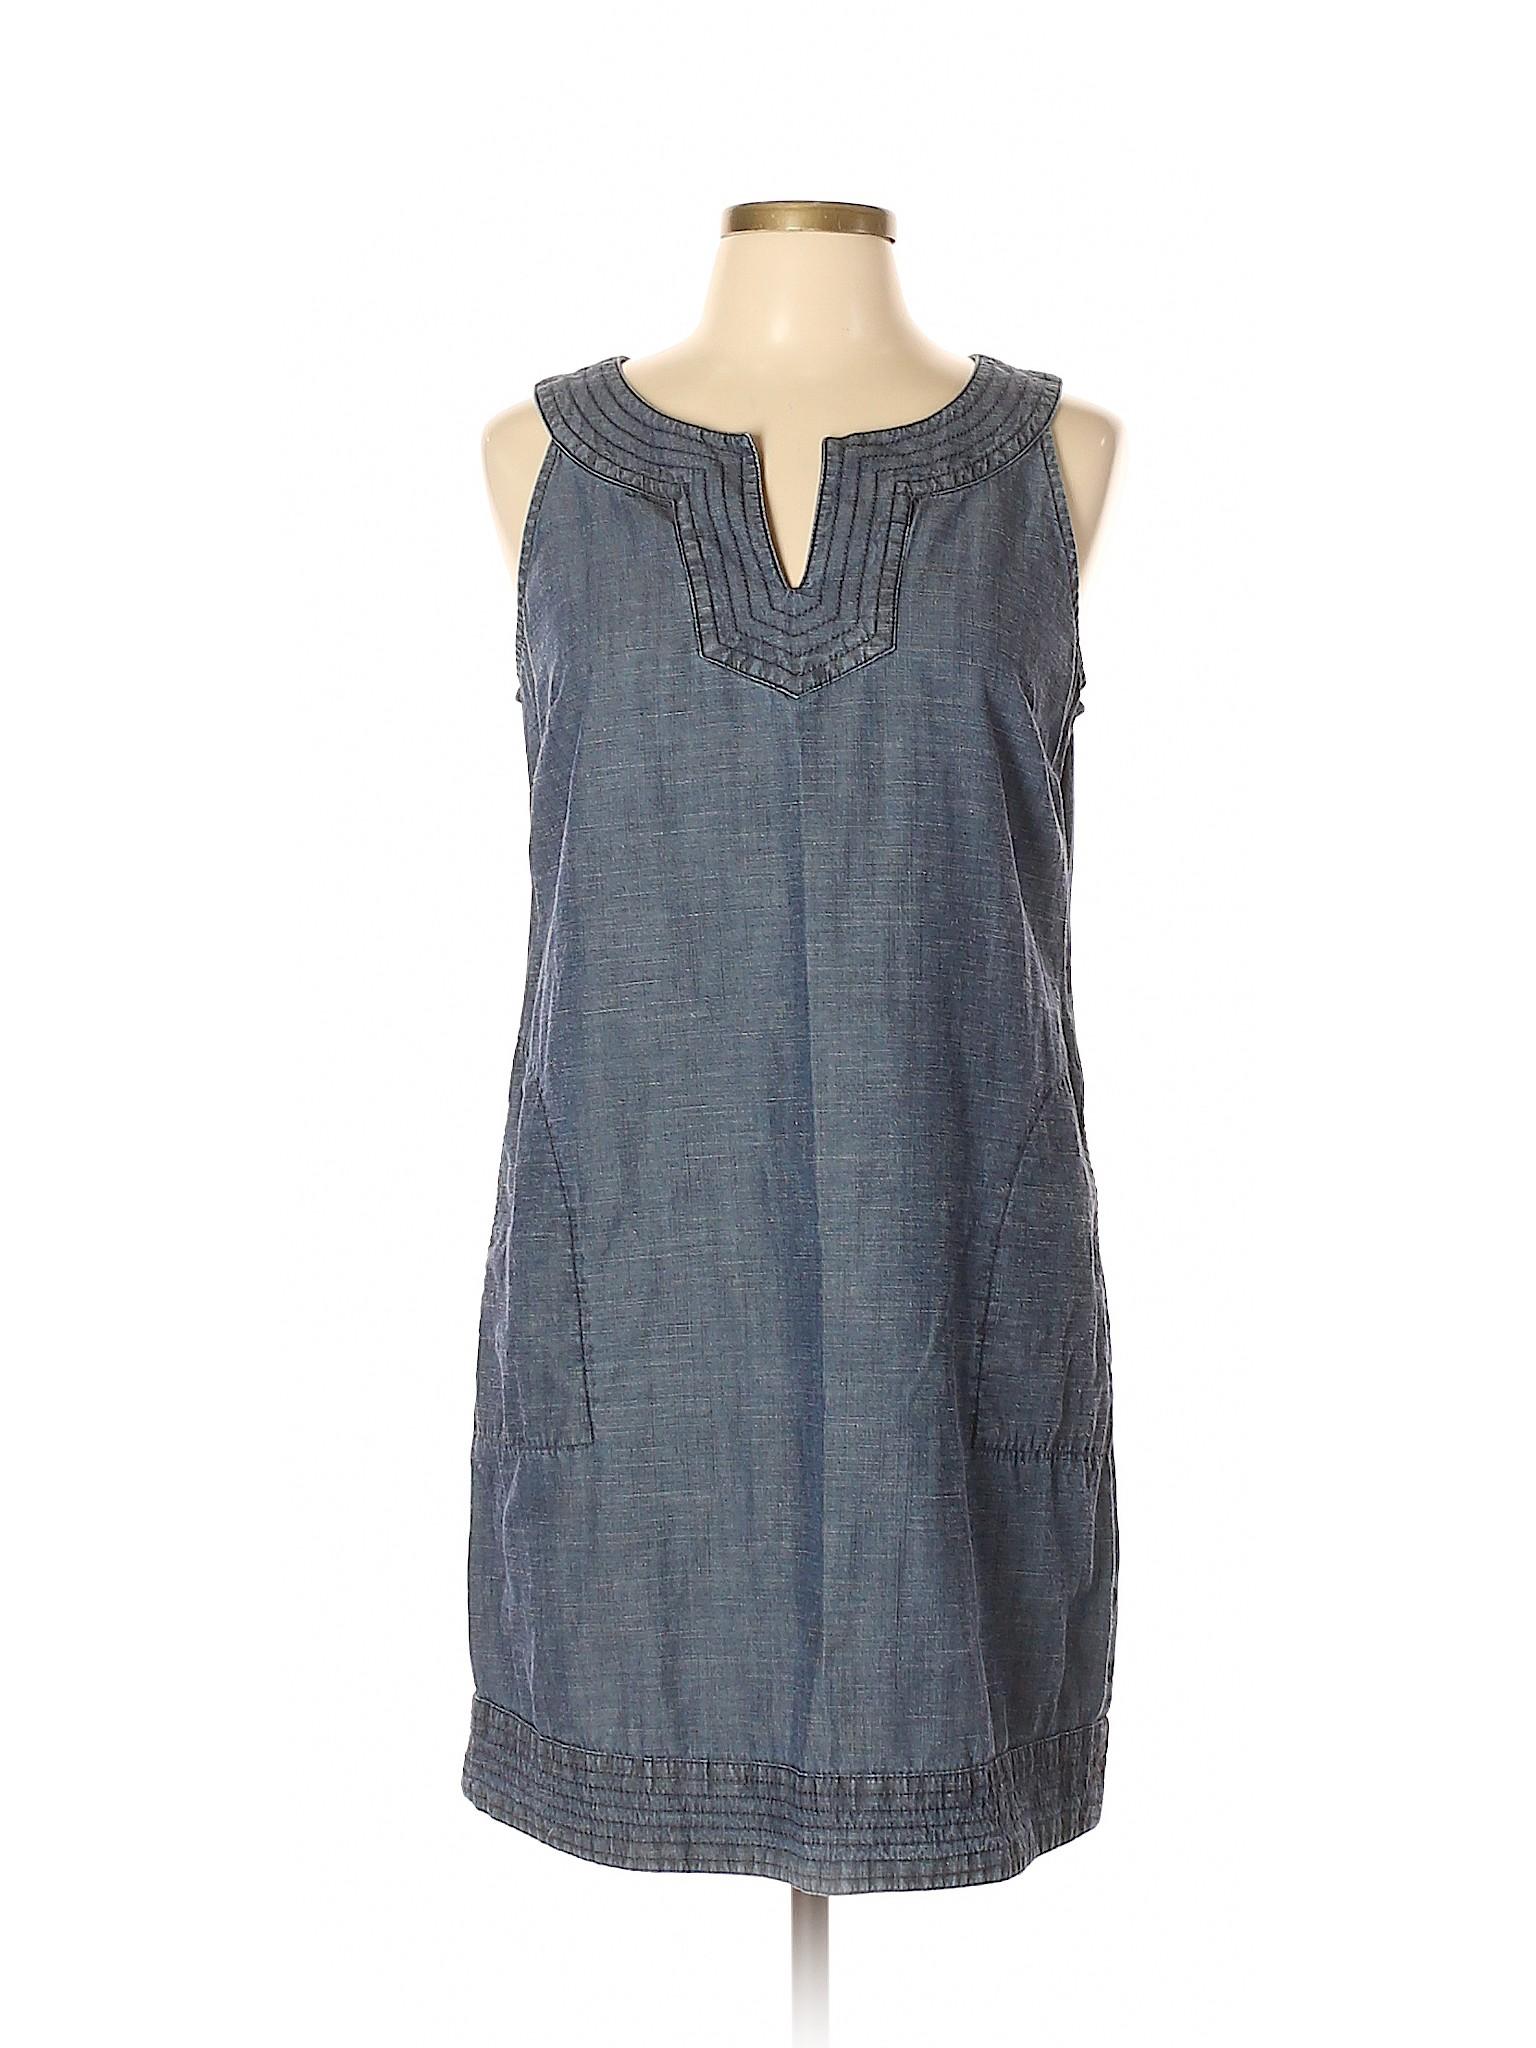 82a0009c5e9a0 J.Jill Women Blue Casual Dress Med Petite | eBay